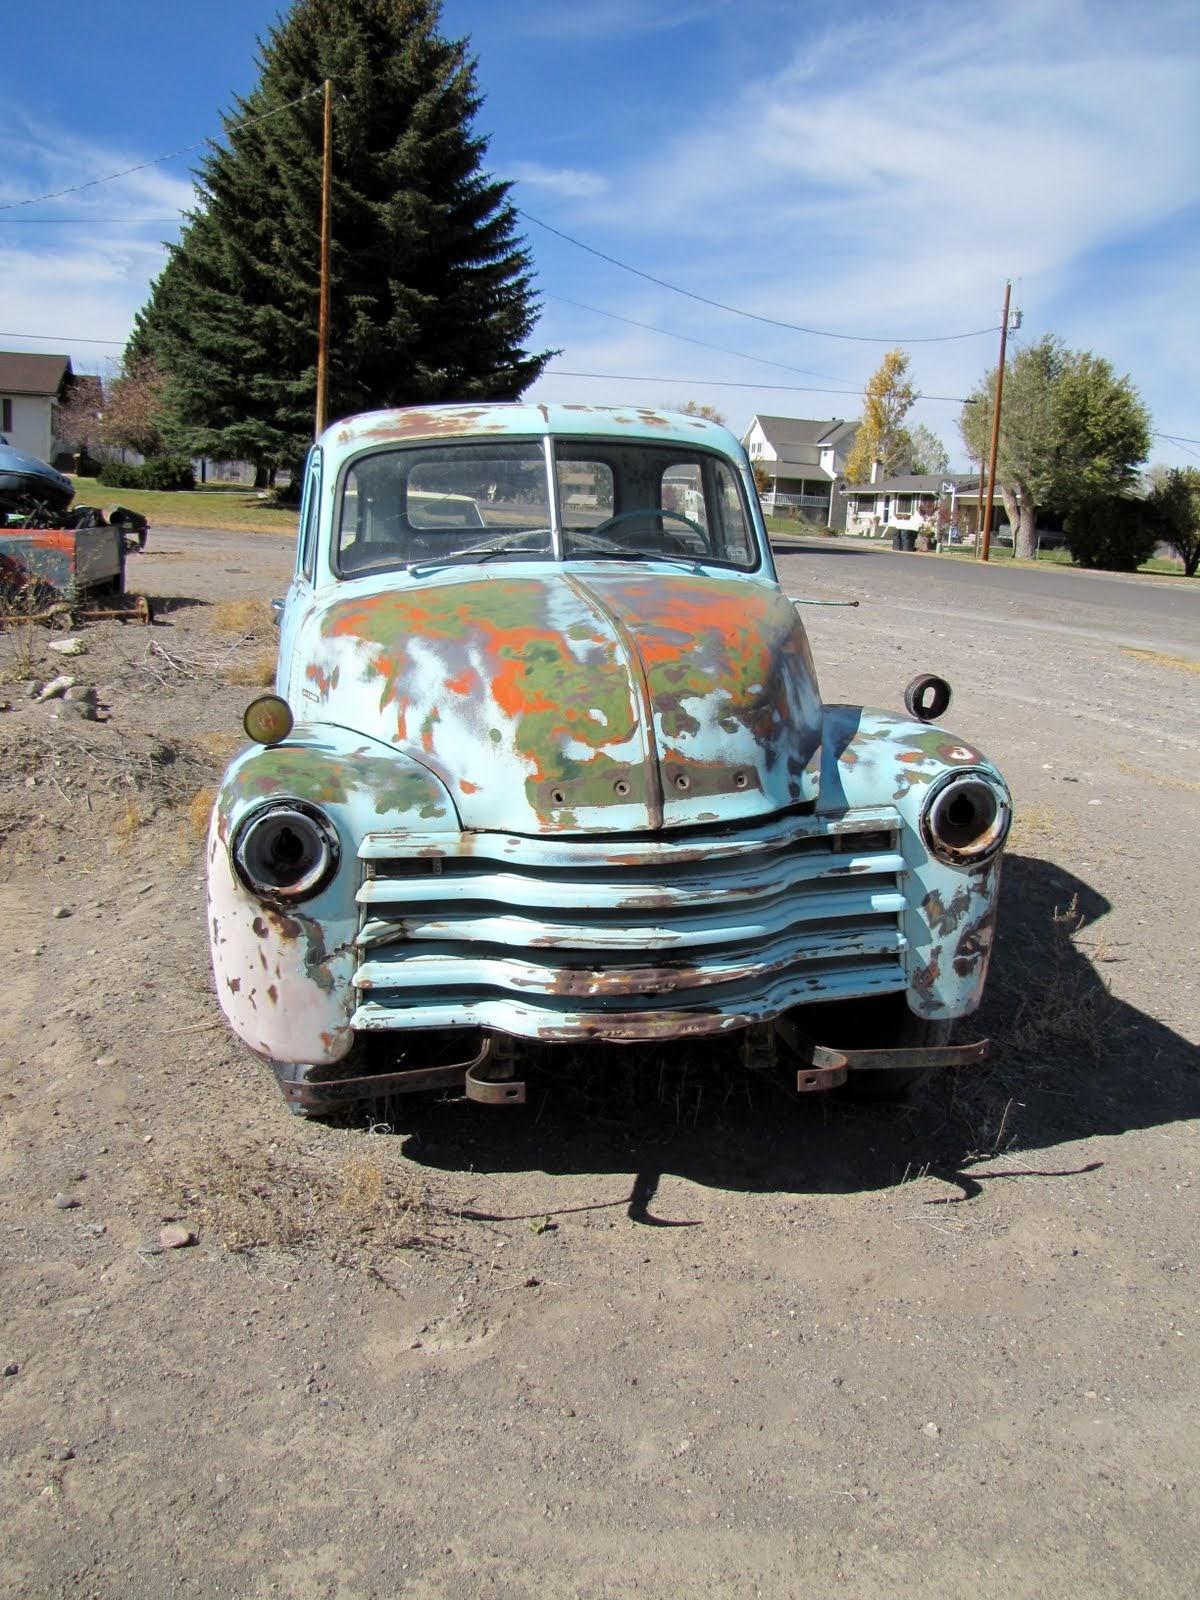 Colors of decades, 1948 Chevrolet Fleetline